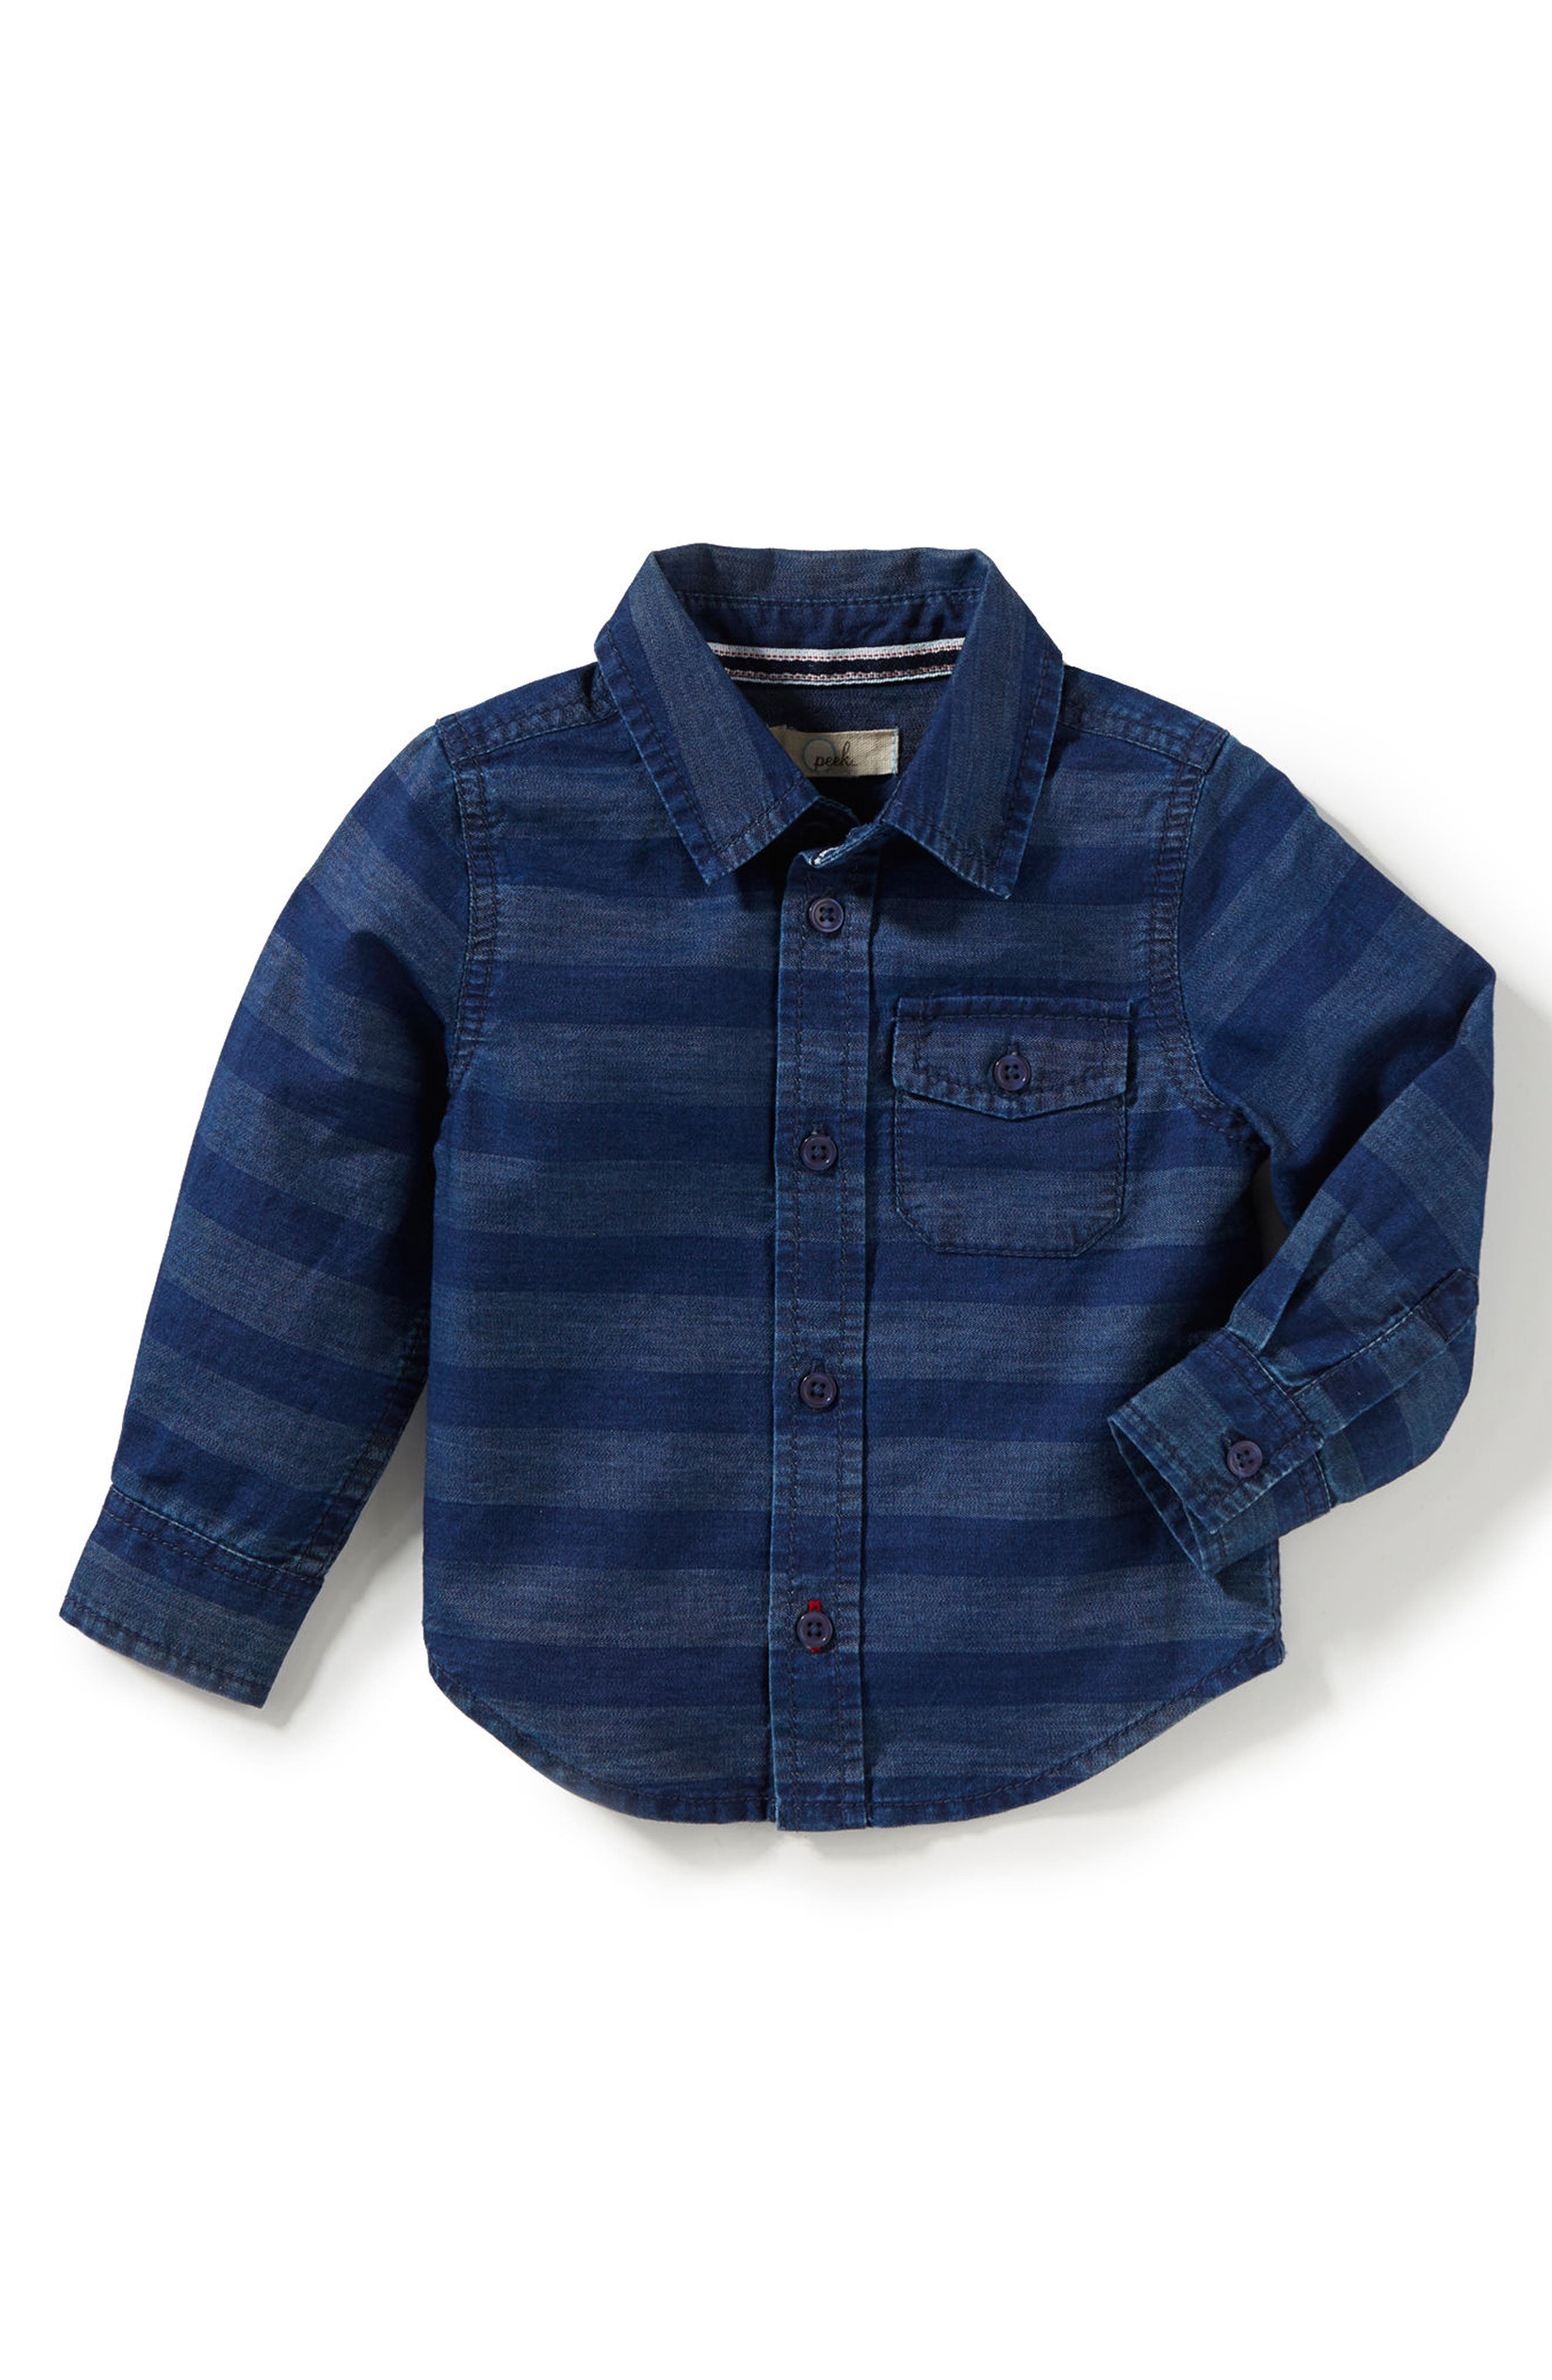 Aiden Stripe Chambray Shirt,                             Alternate thumbnail 2, color,                             402